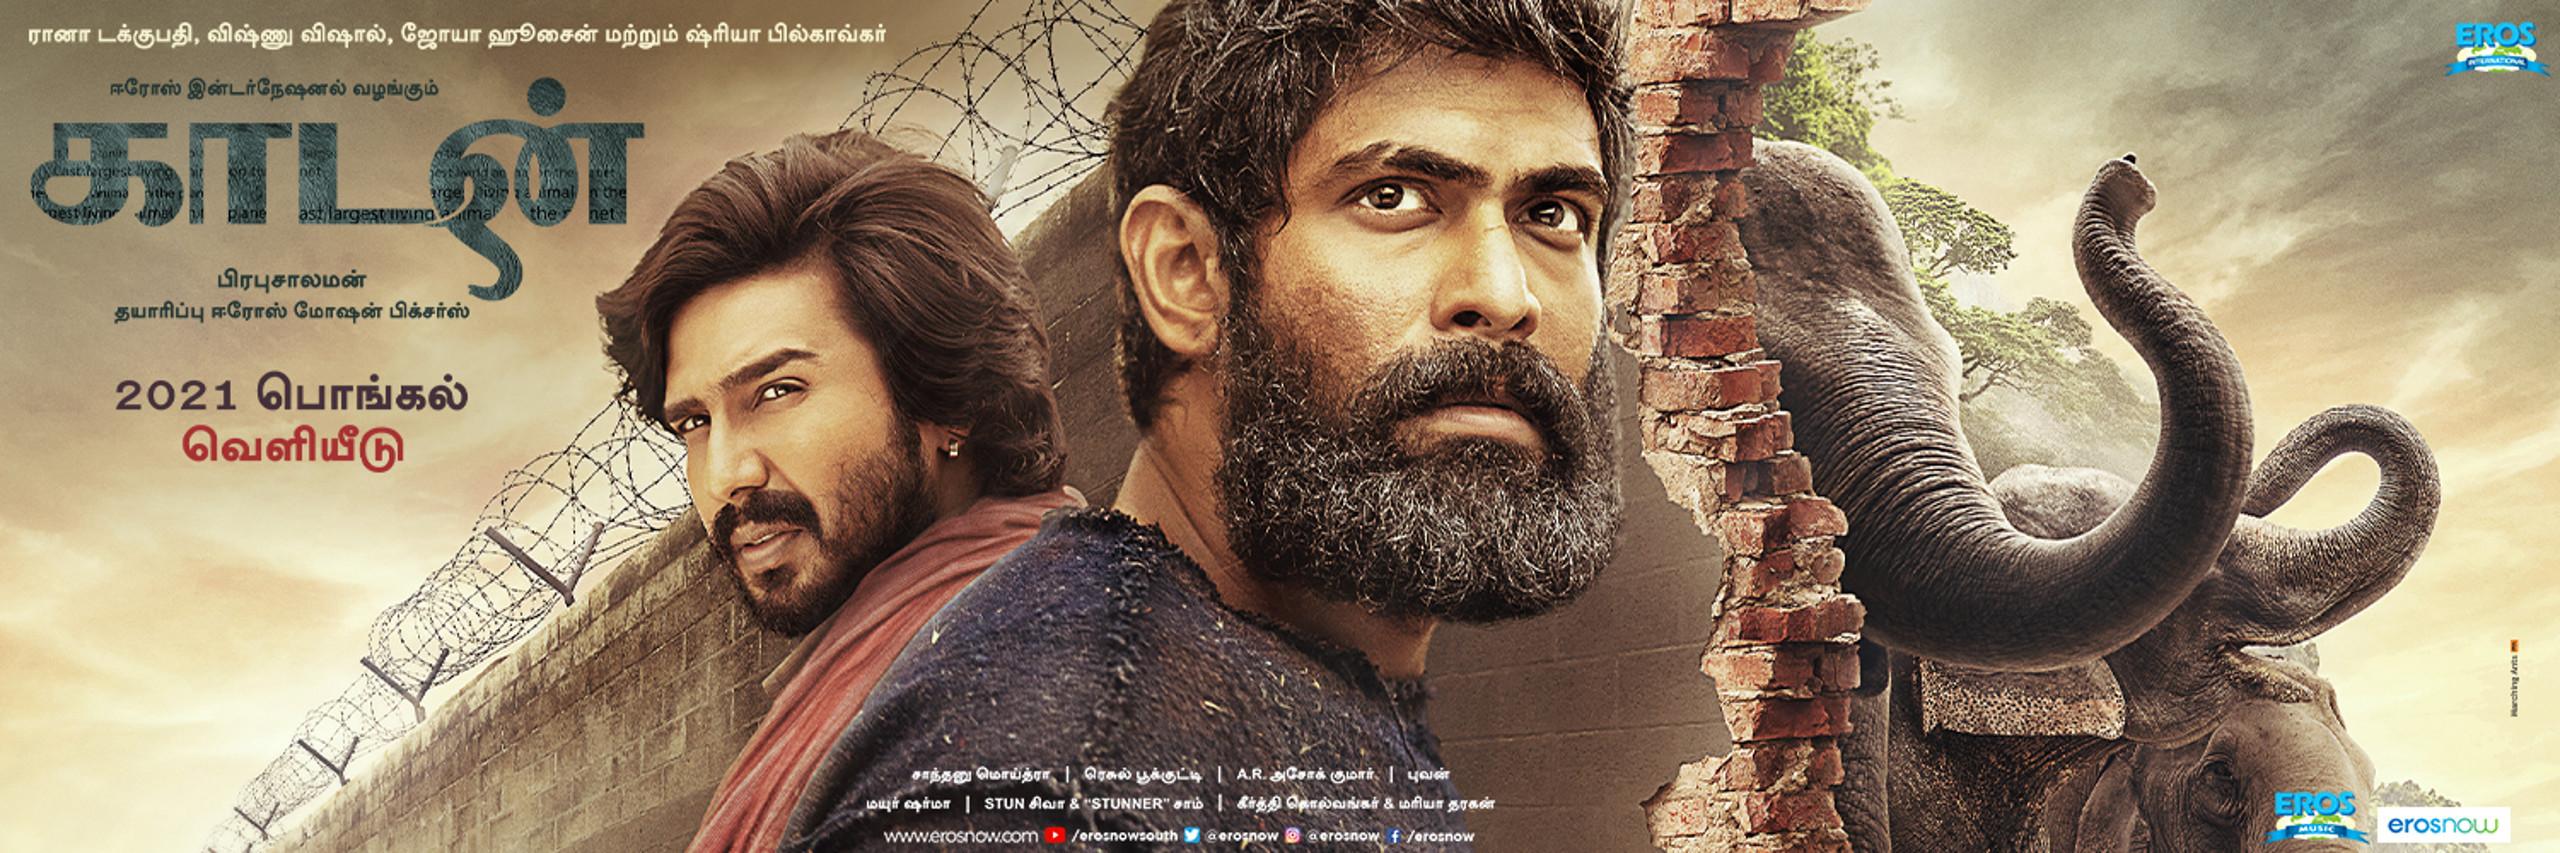 Rana Daggubati & Vishnu Vishal in Kaadan Movie Pongal Release Poster HD